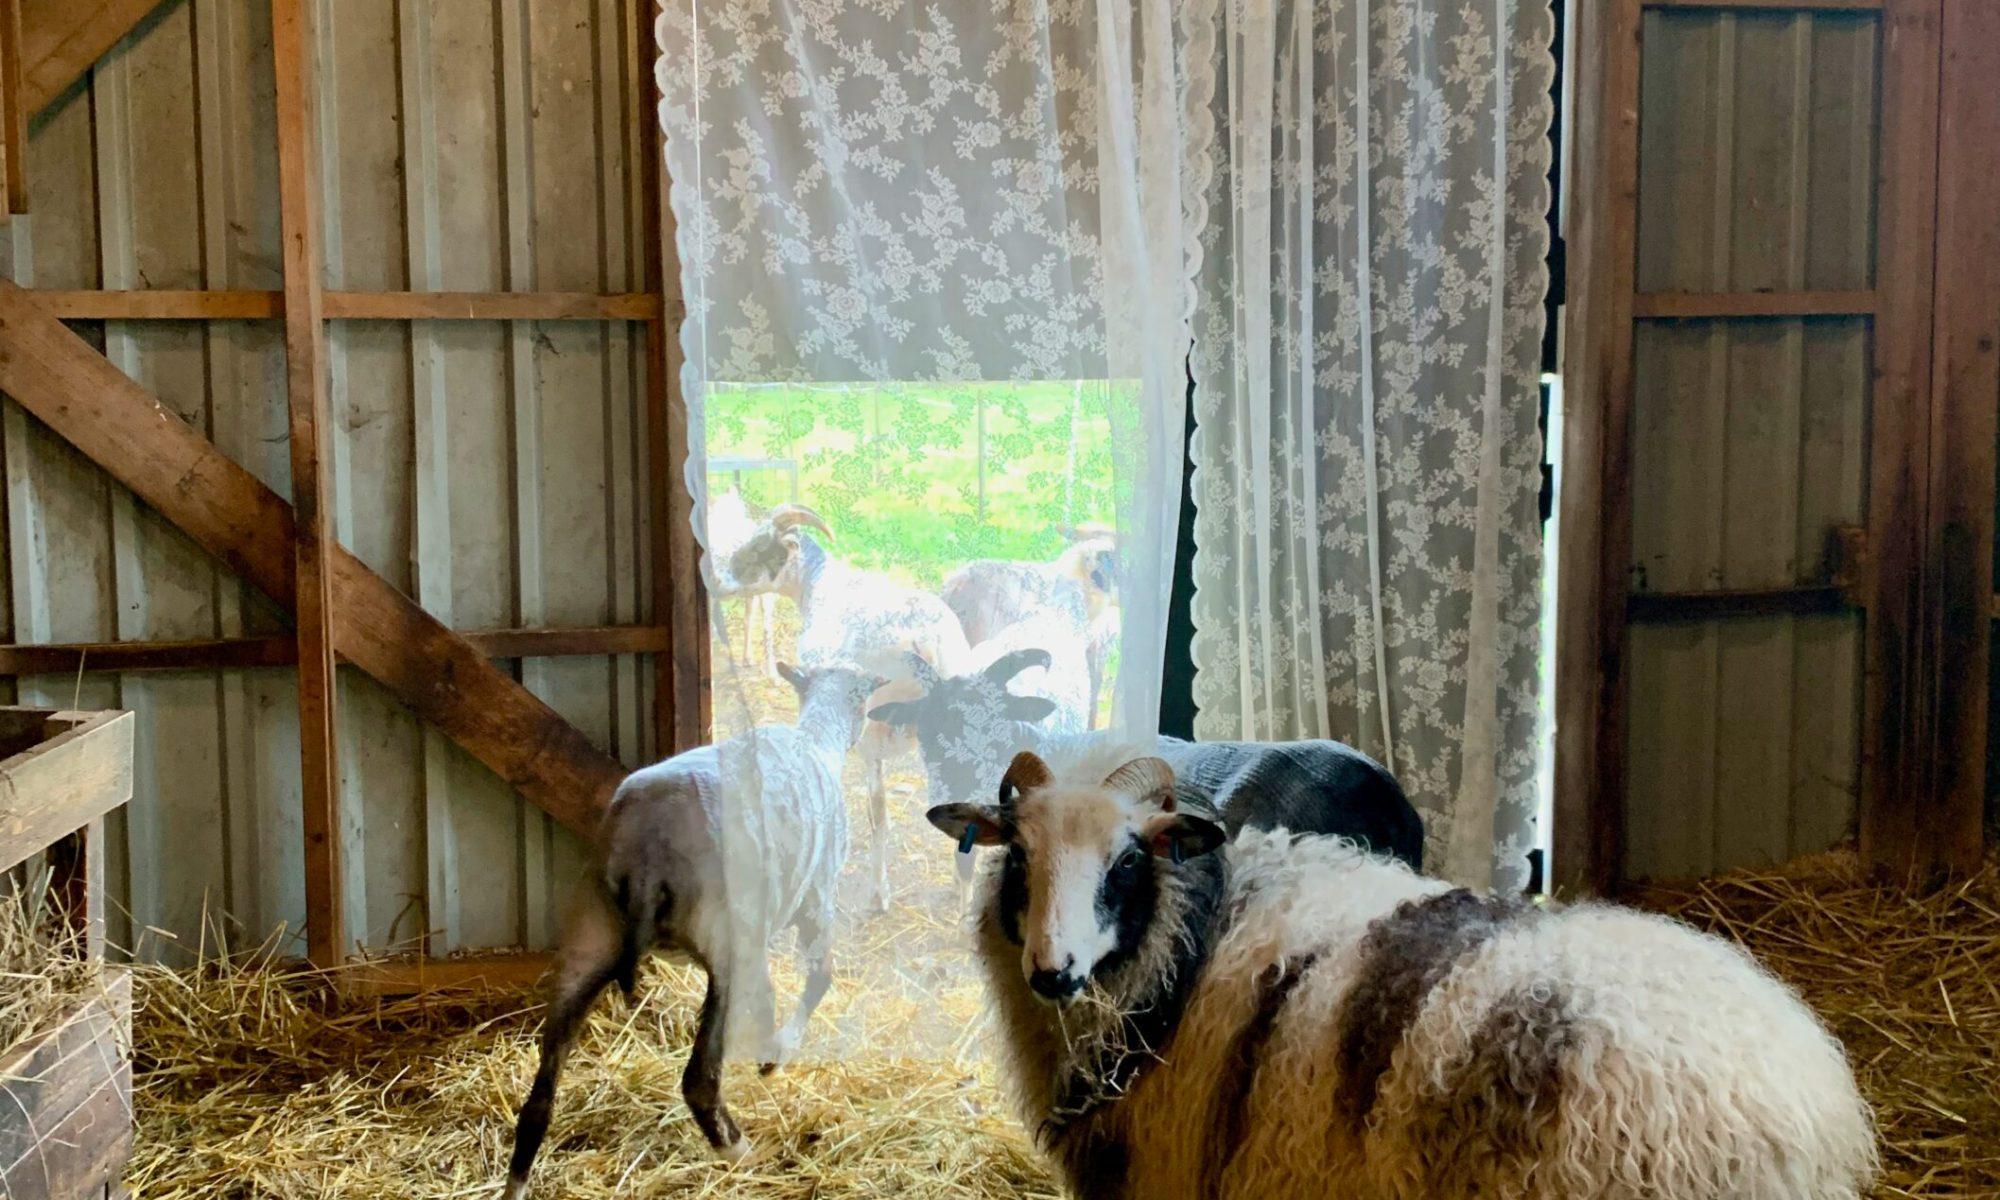 Gunvor the Gestrike ewe who was my longitudinal fleece study sheep